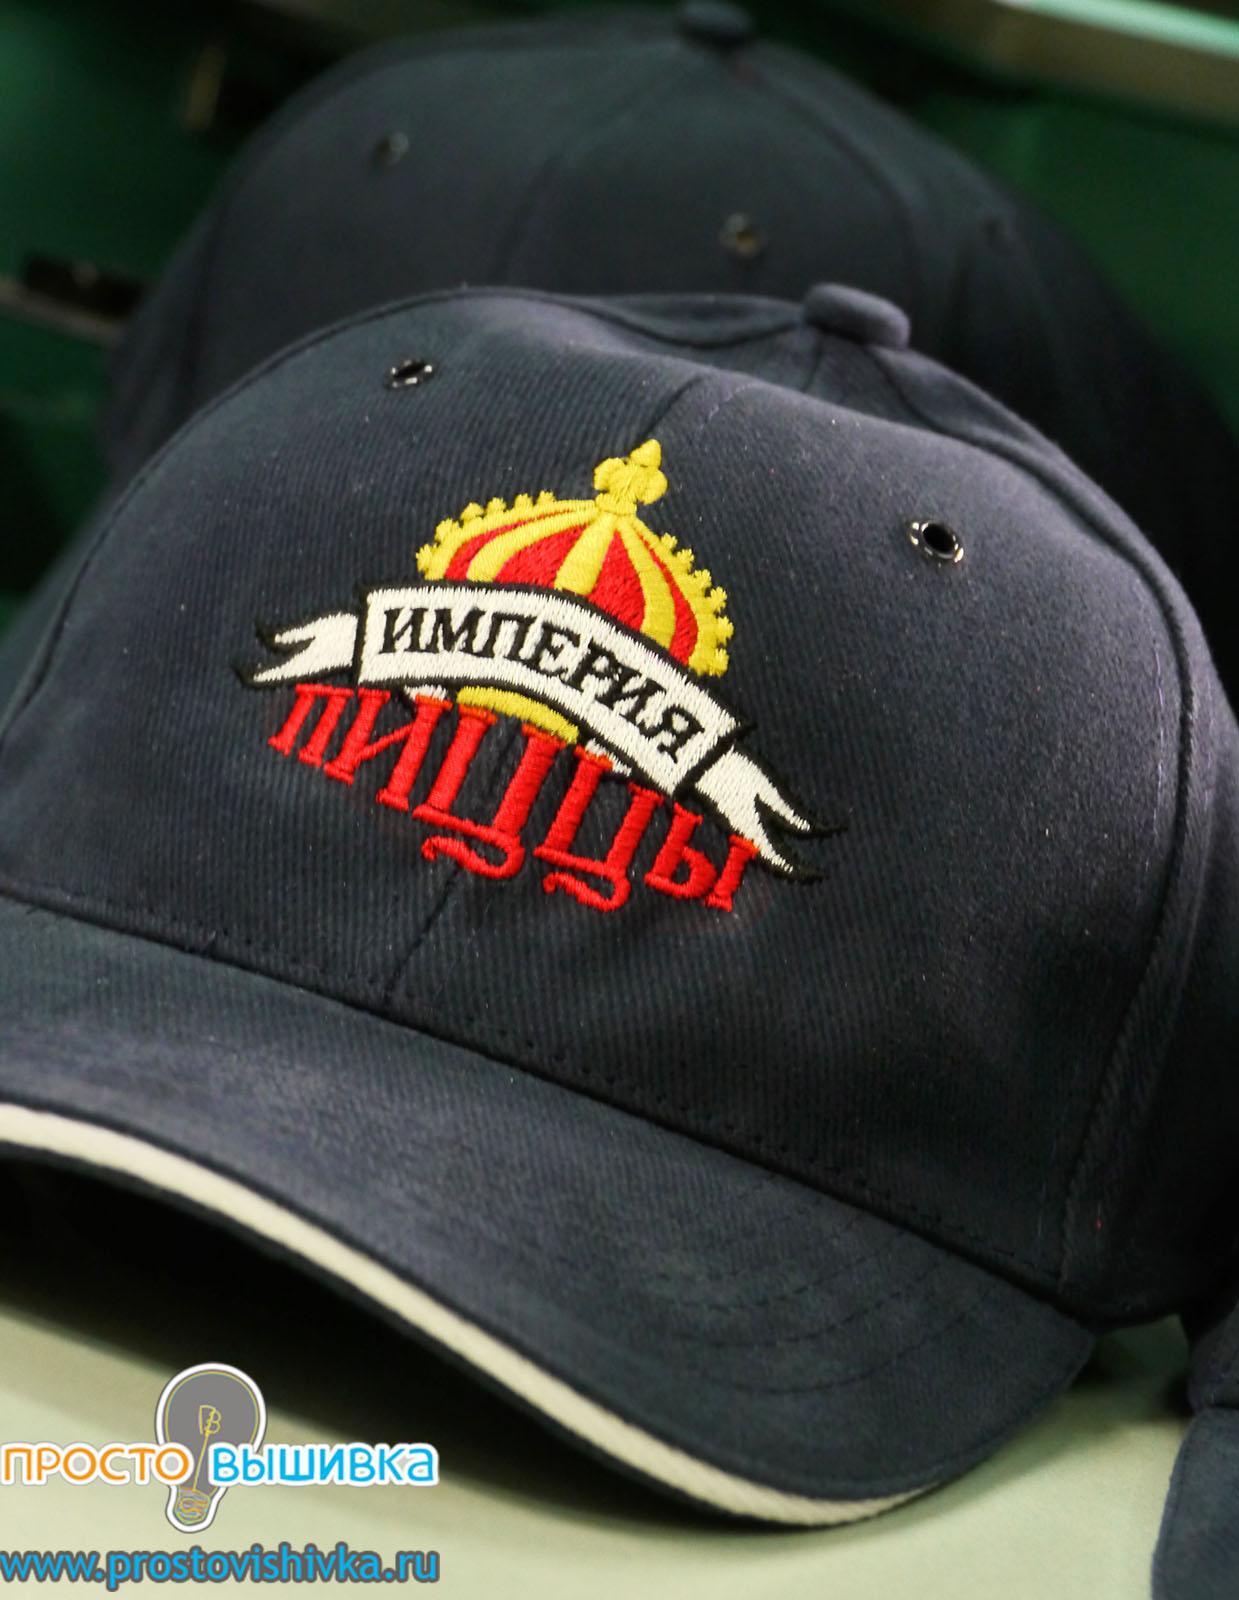 Бейсболка с логотипом Империя пиццы: prostovishivka.ru/vishivka_logotipa_na_odezhde.php